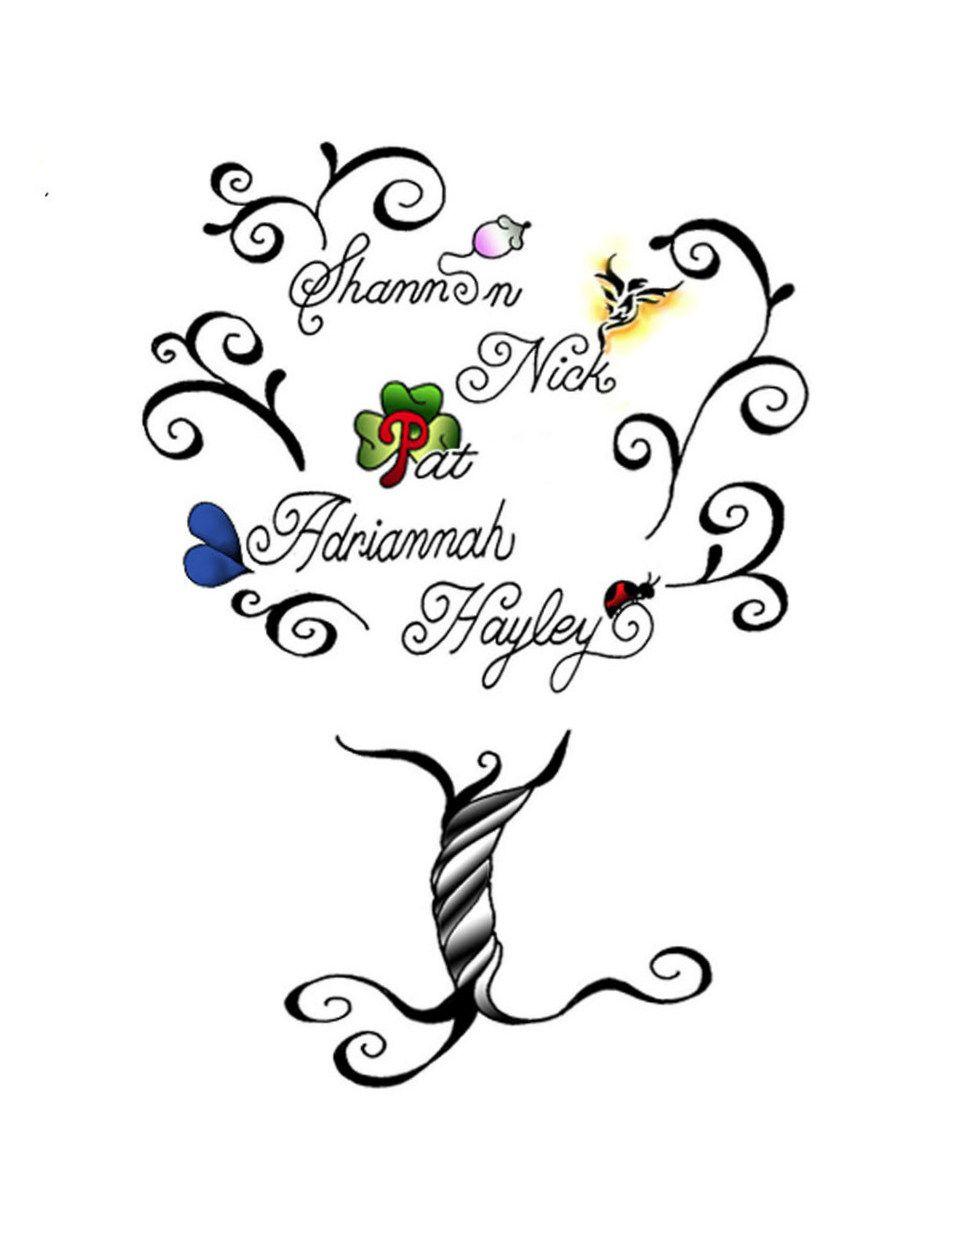 Tattoo of my family tree (kids and grandkids) symbols